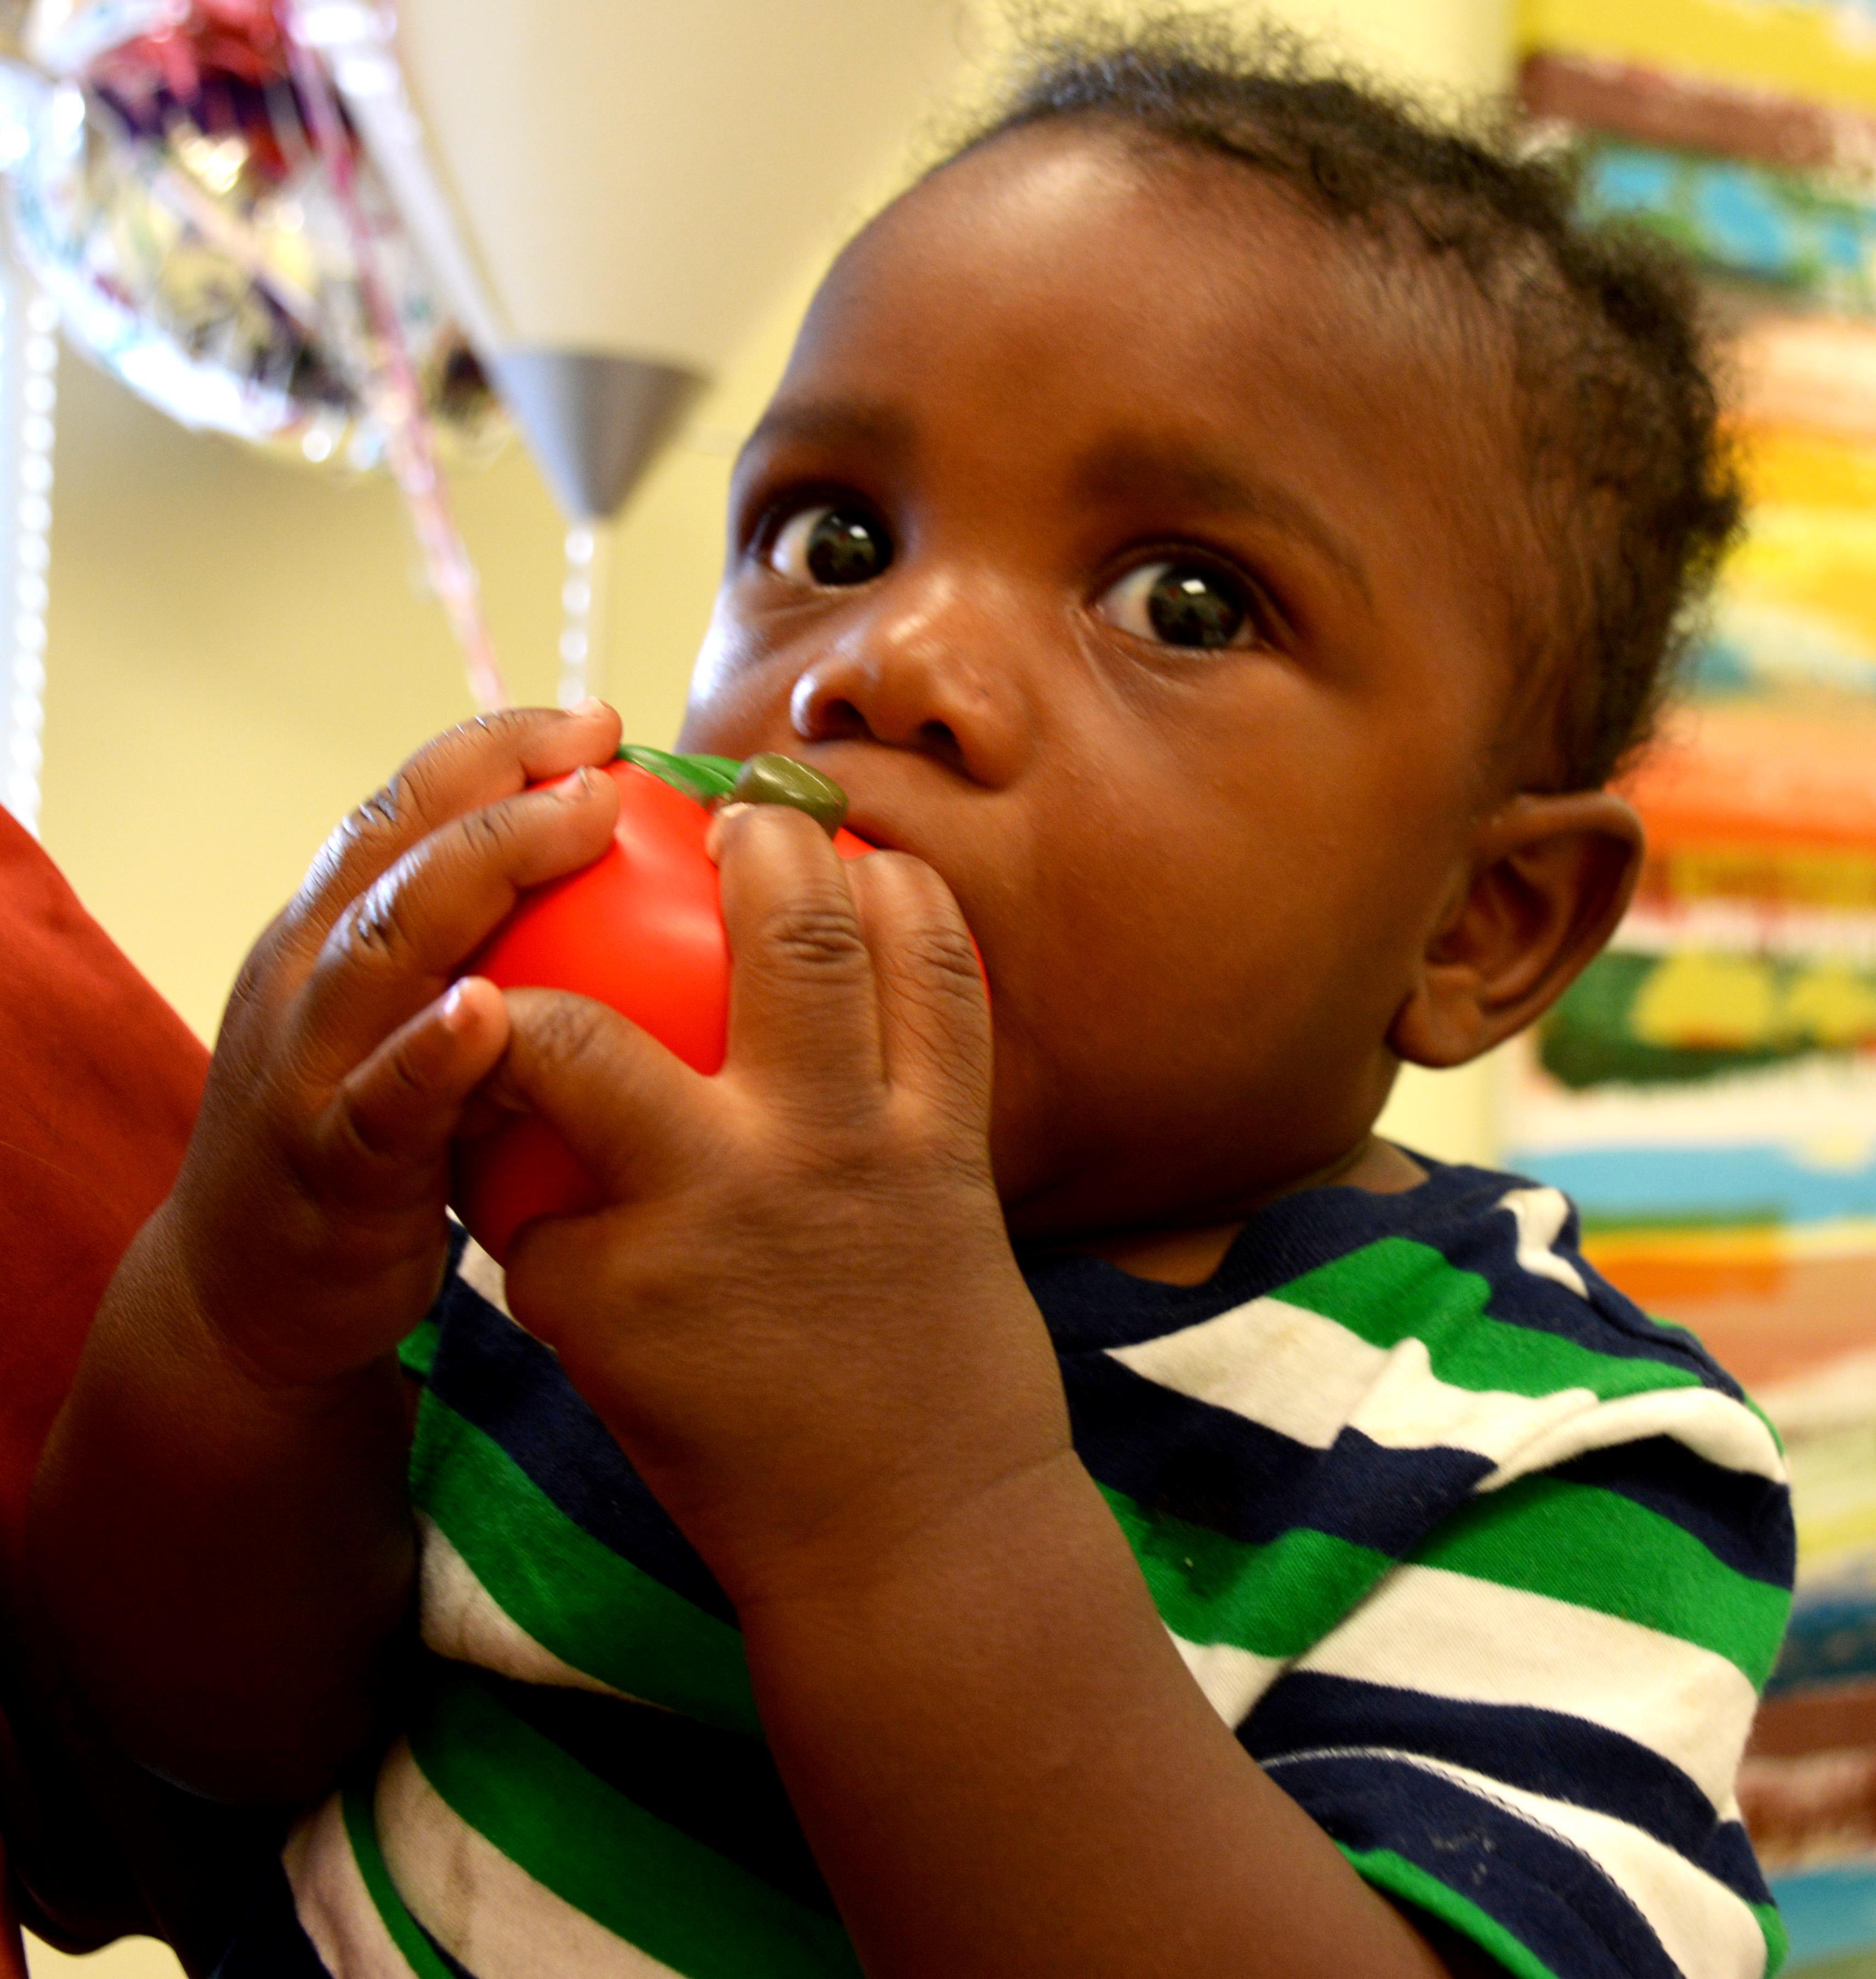 Local Church Teams with Feeding South Florida